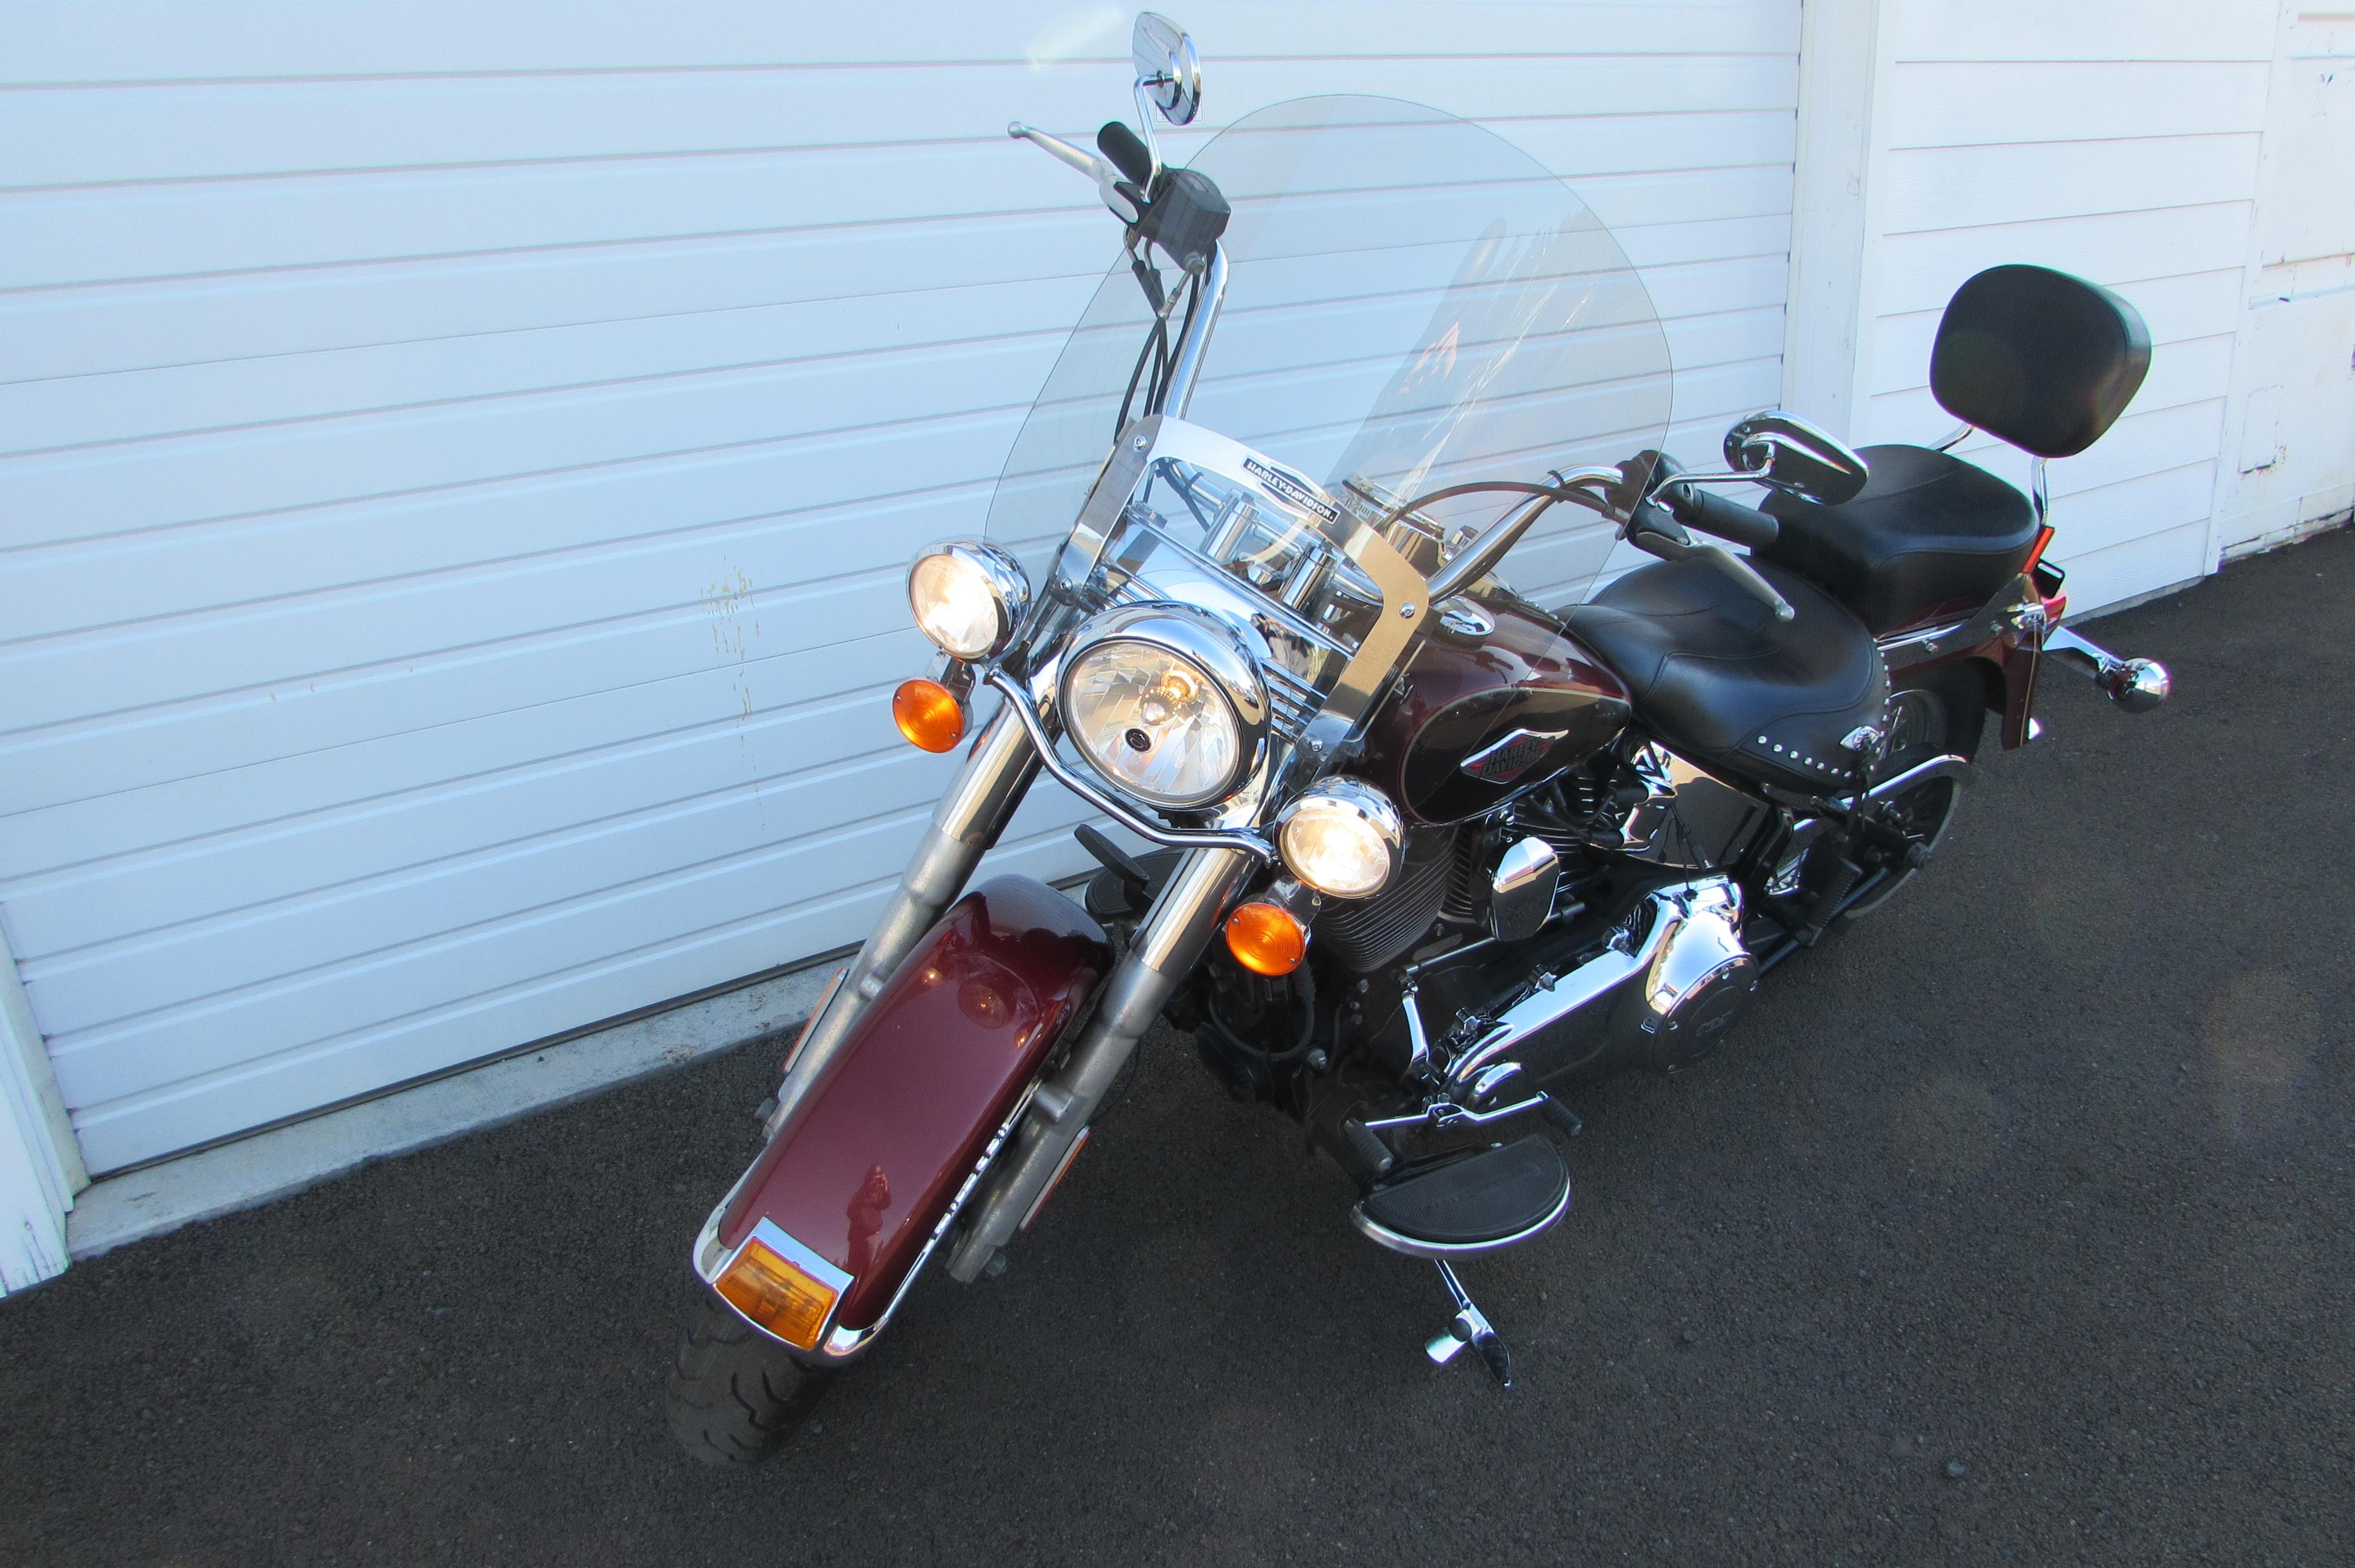 2015 Harley Davidson FLSTC Heritage